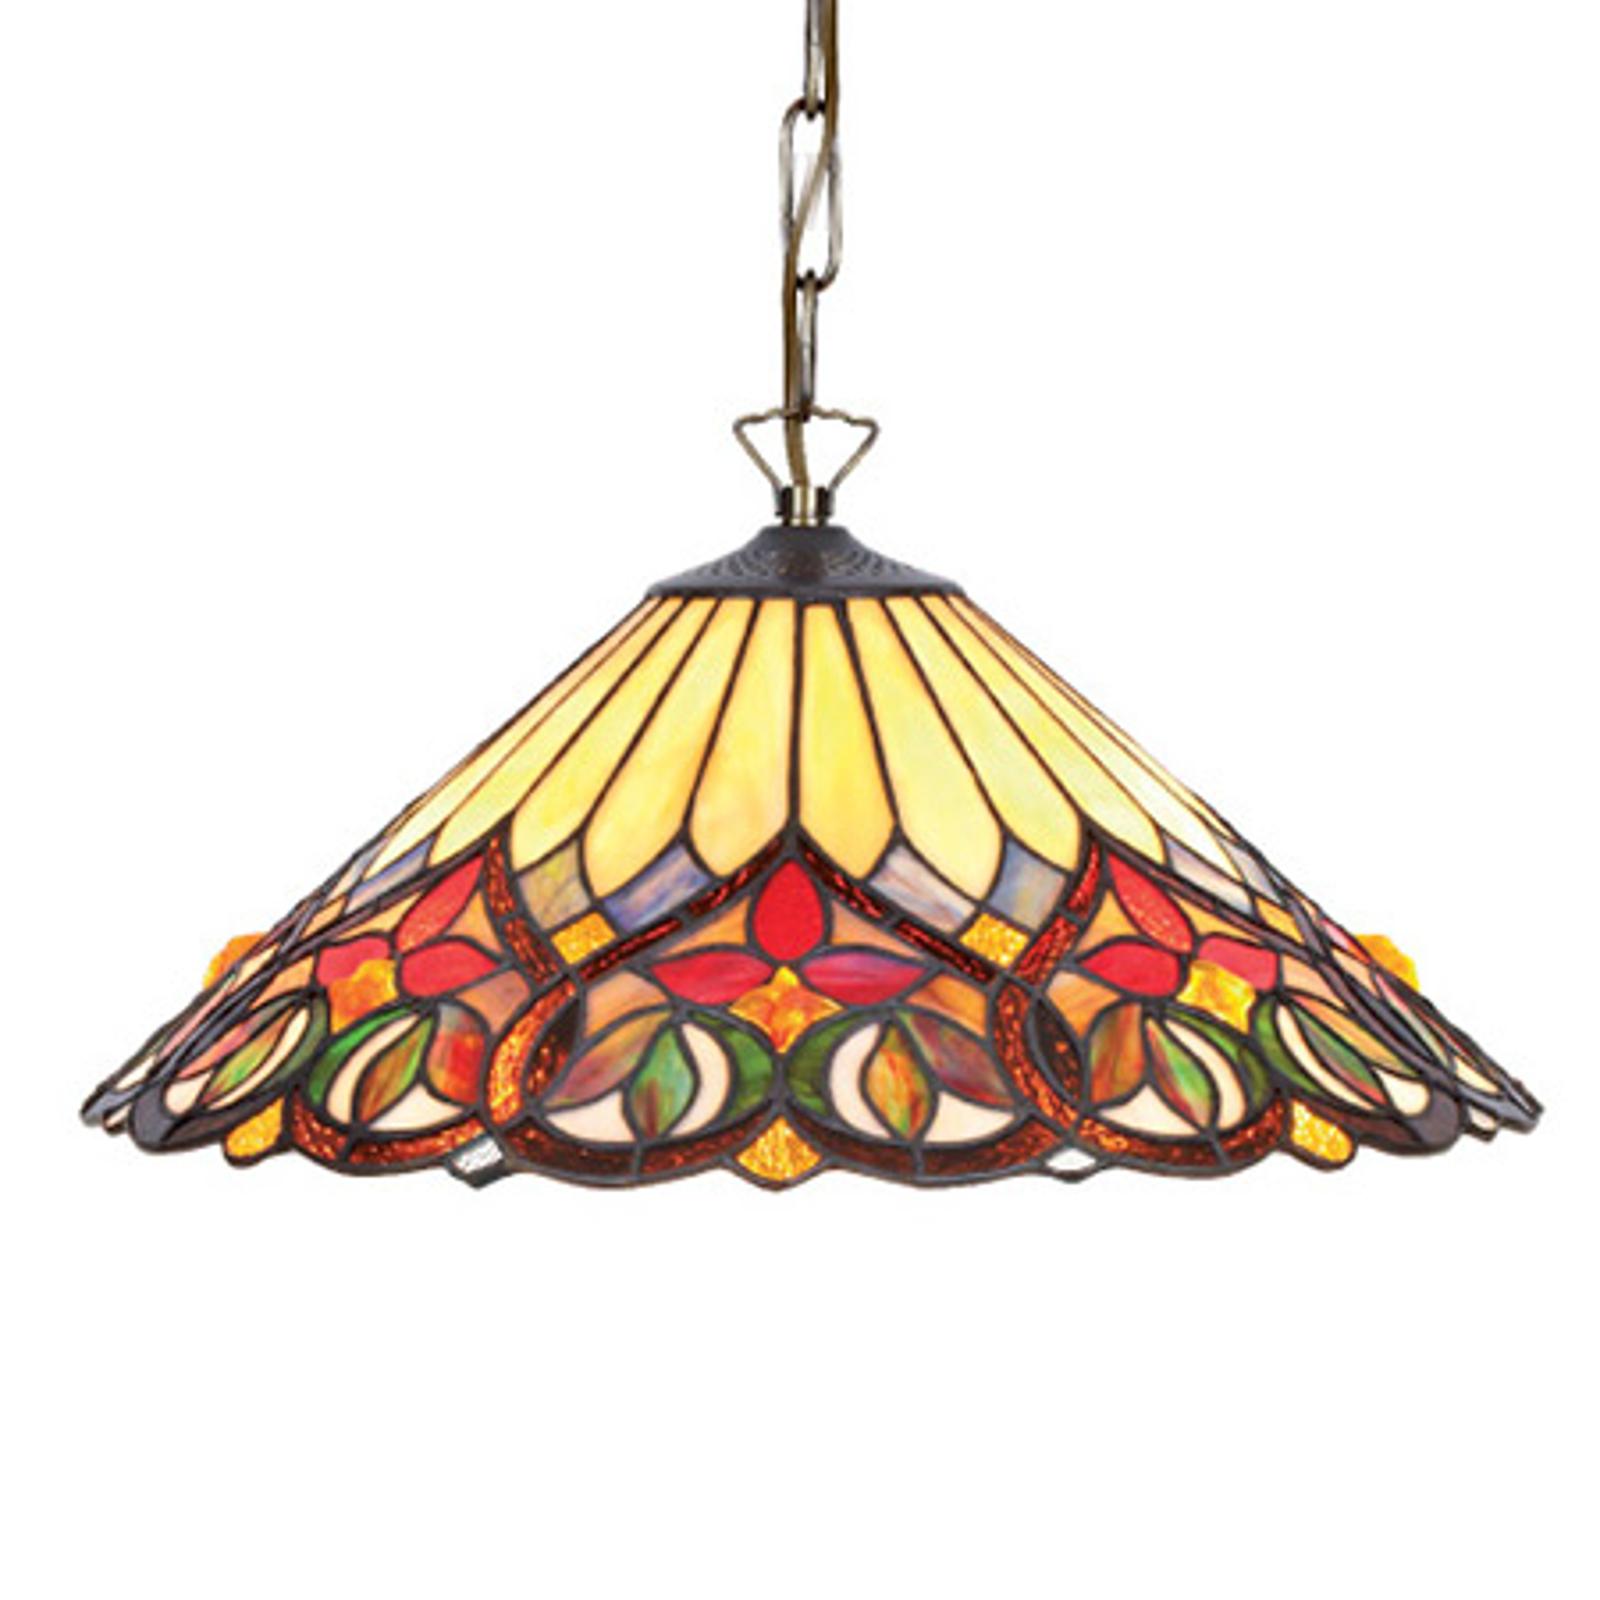 Kolorowa lampa wisząca ANNI w s. Tiffany